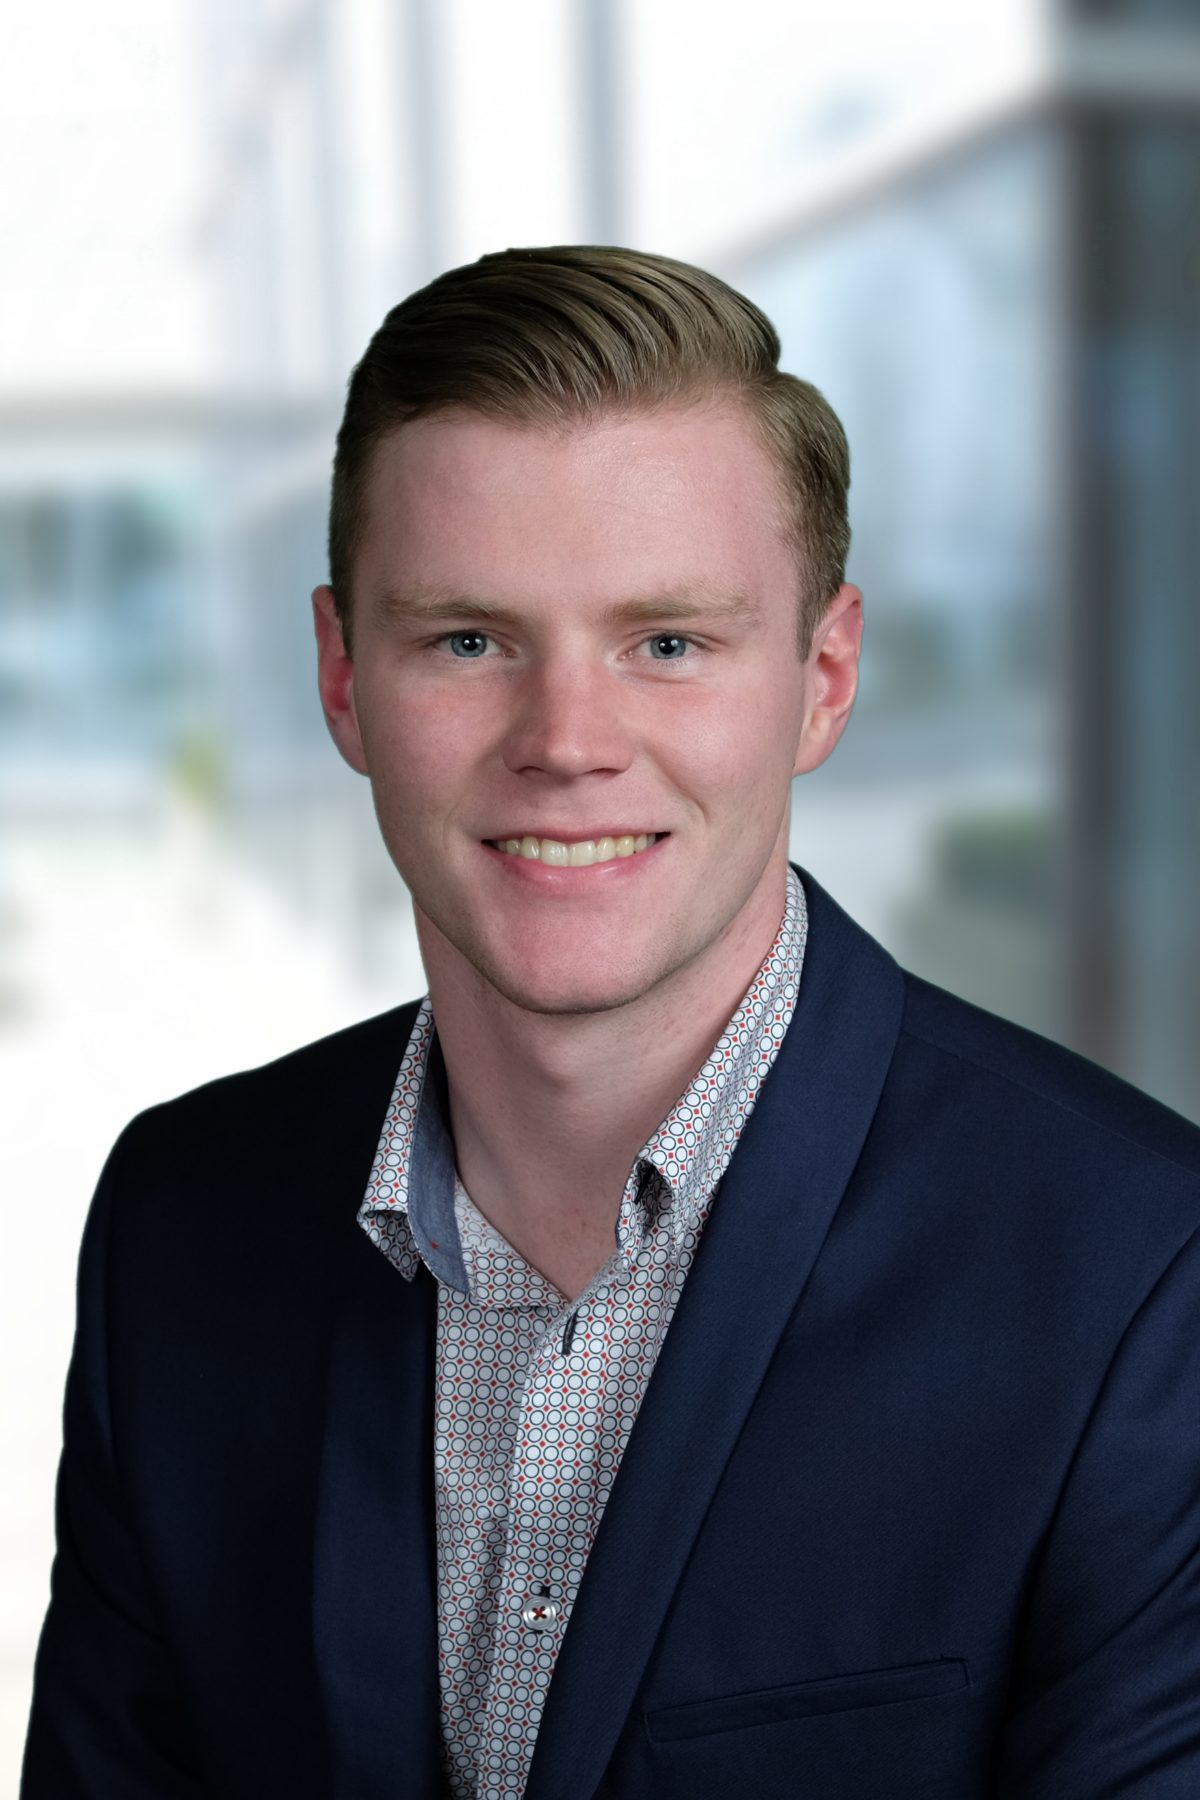 Kevin-Robertson-Estimator Our Team